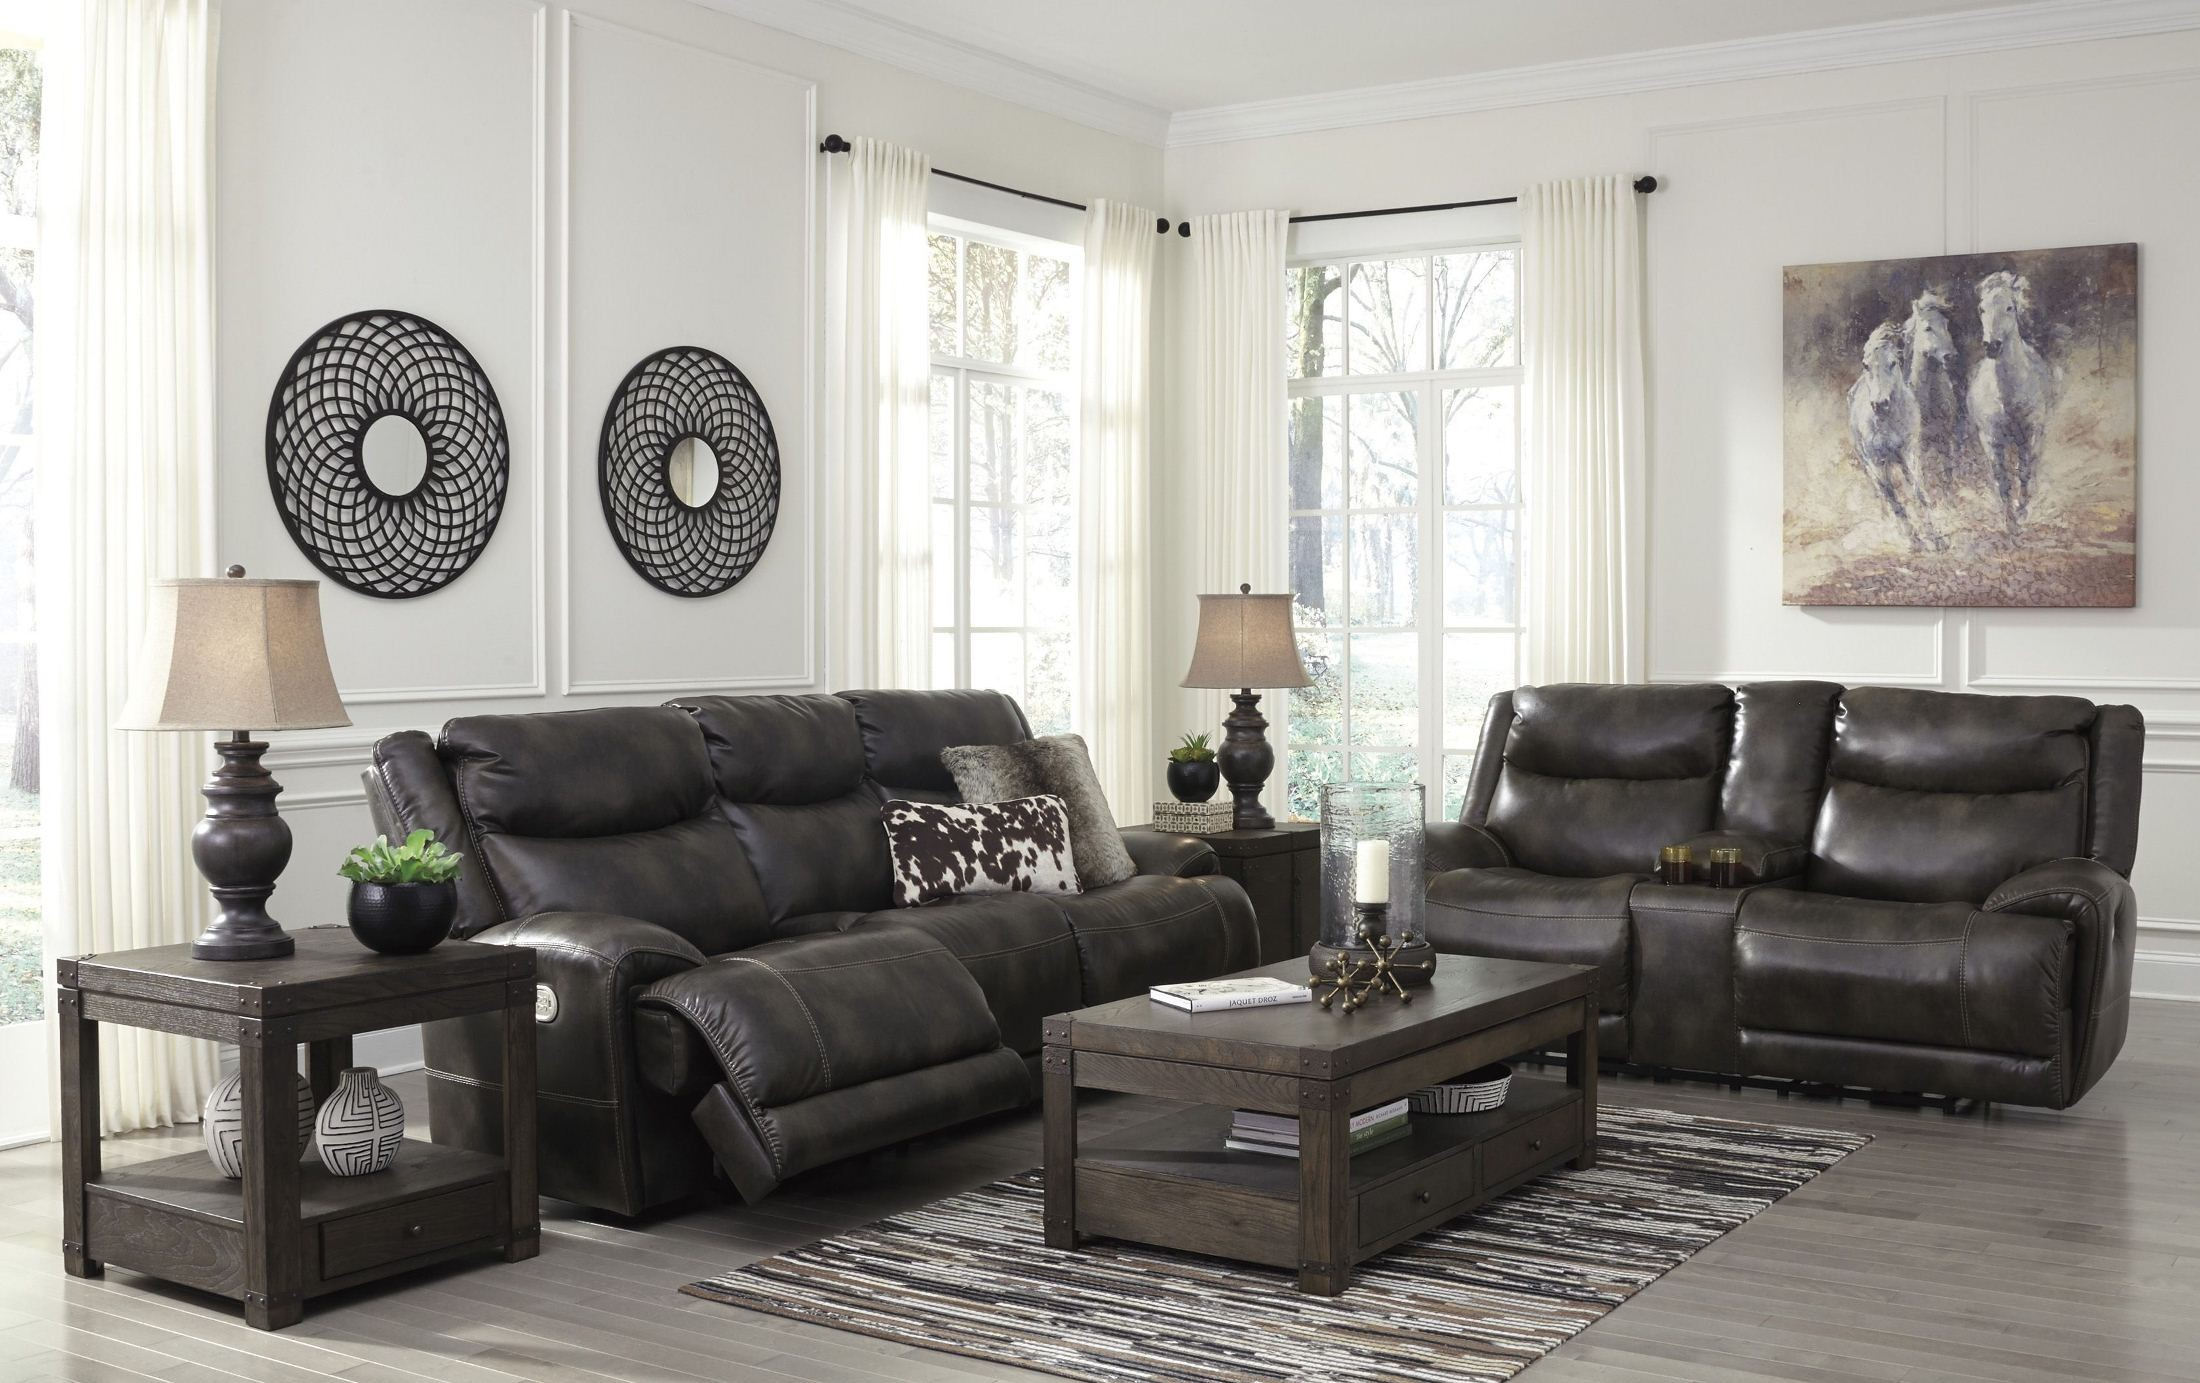 Brinlack Gray Power Reclining Living Room Set from Ashley   Coleman ...